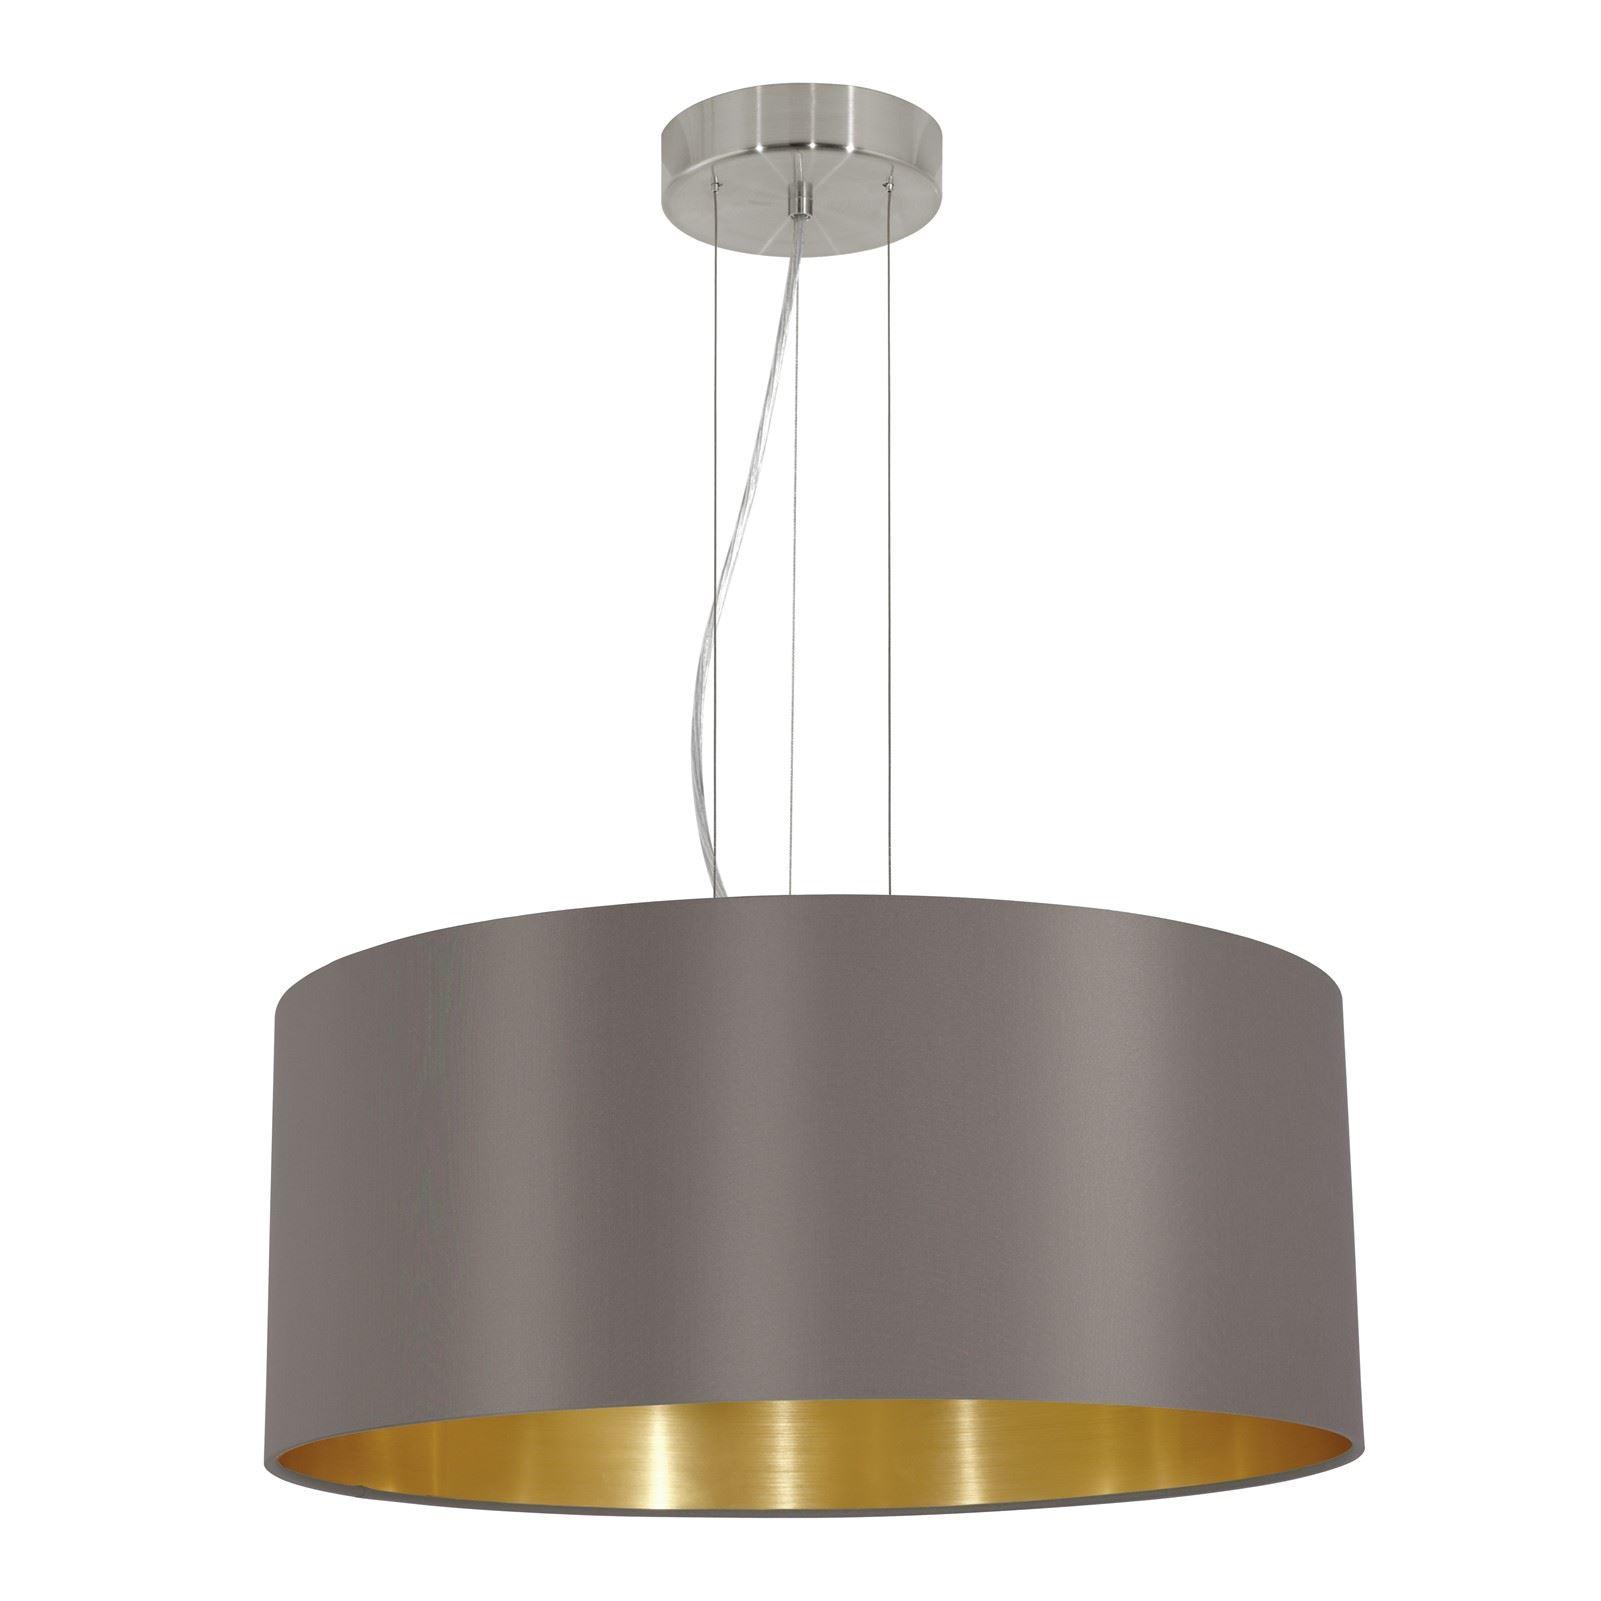 Maserlo Steel Hanging 3 Light Satin Nickel Fabric Matt Cappuccino Shade